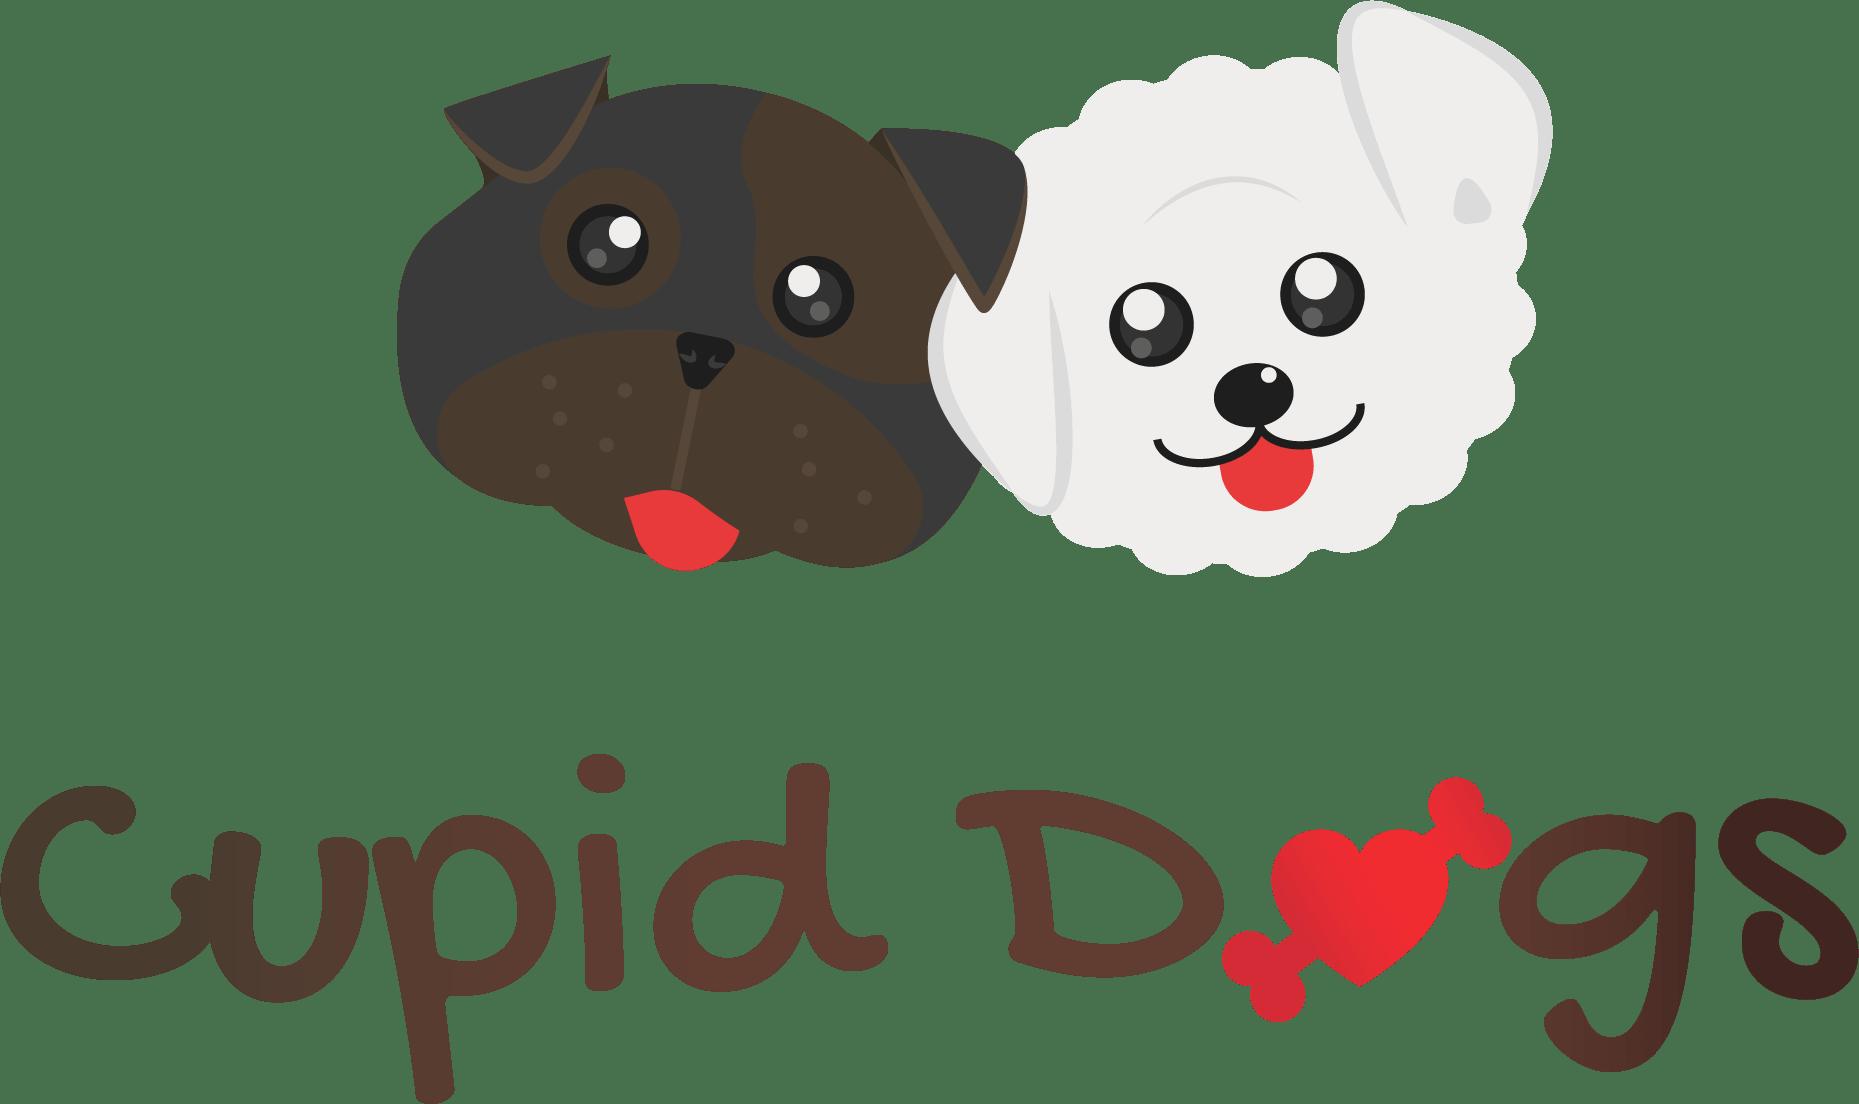 Cupid Dogs